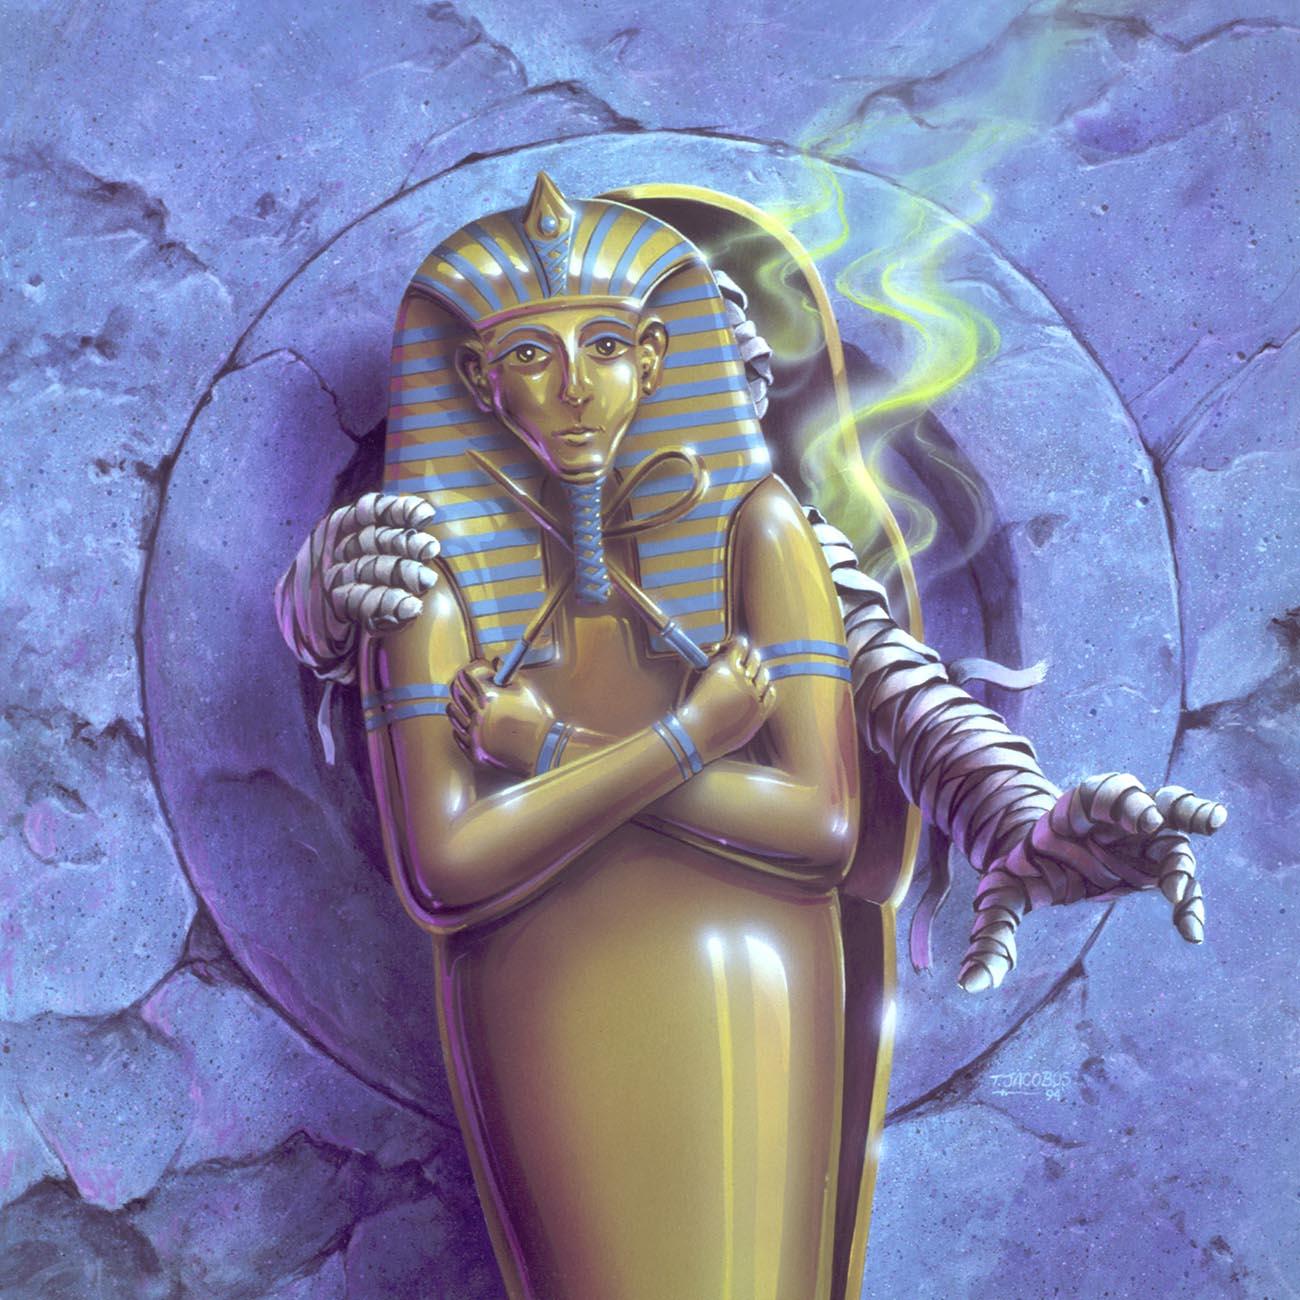 23 – Return of the Mummy